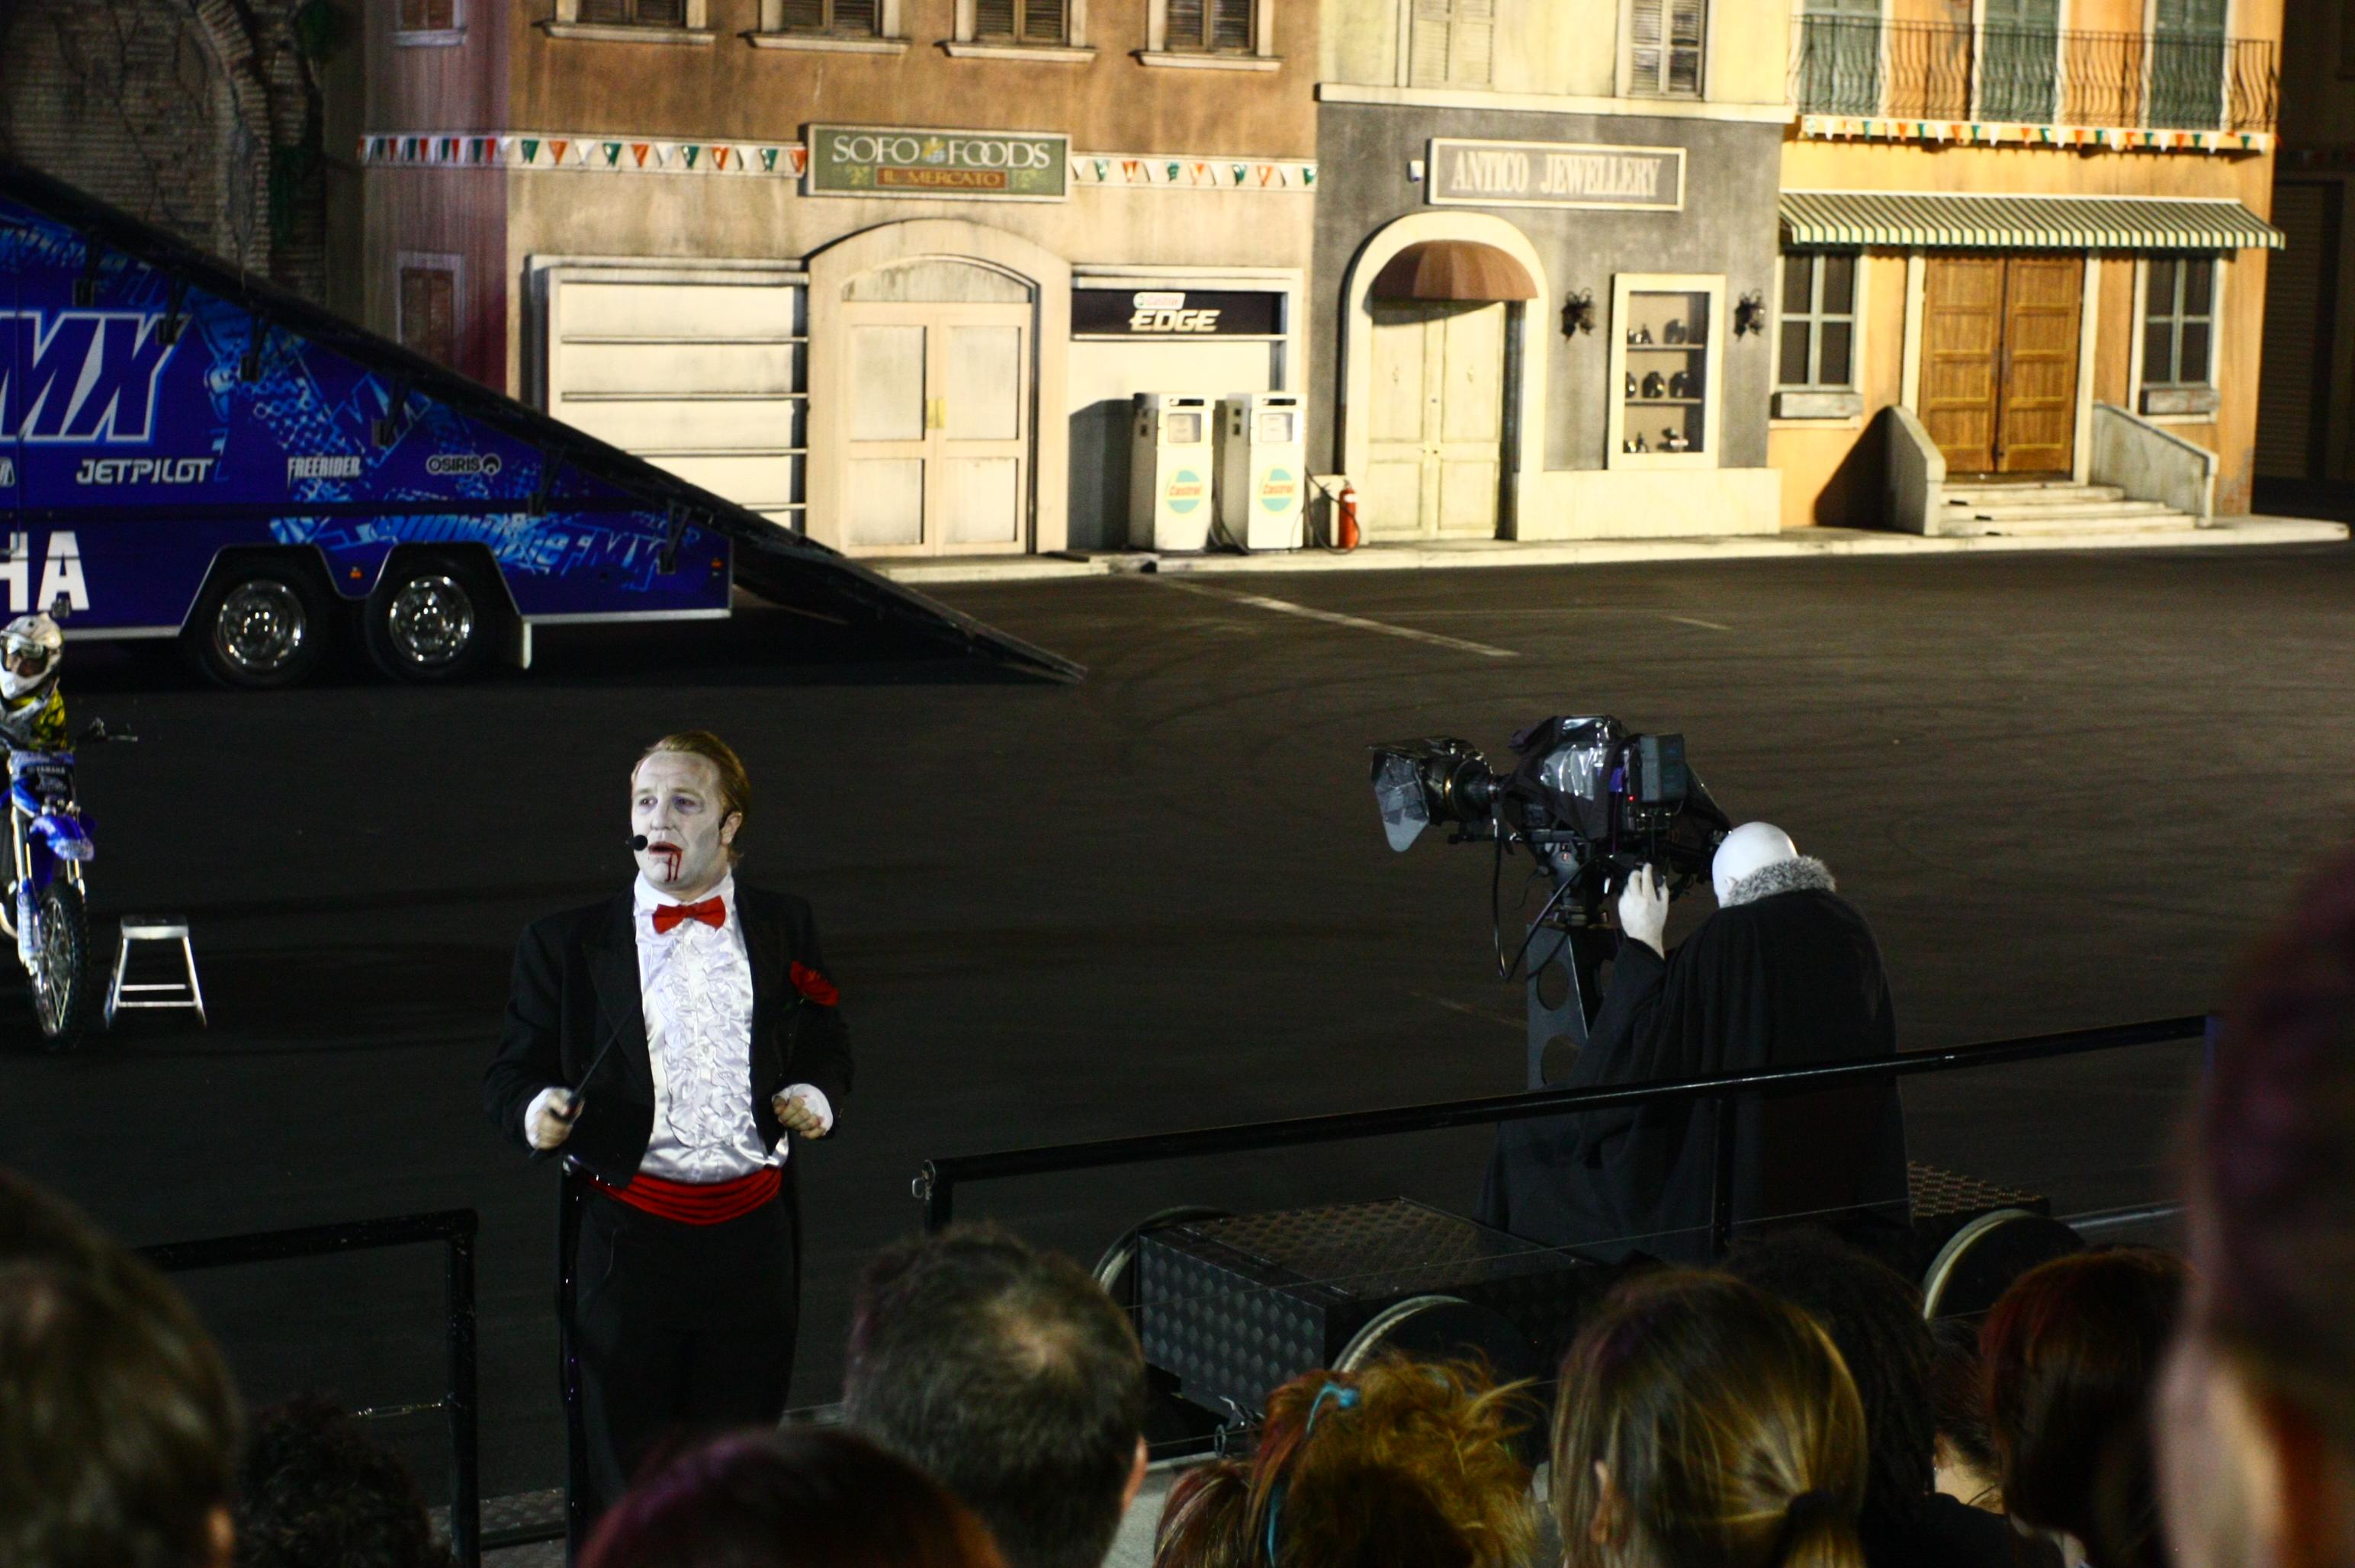 filebloody freestyle motox halloween fright nights movie worldjpg - Halloween Movie History